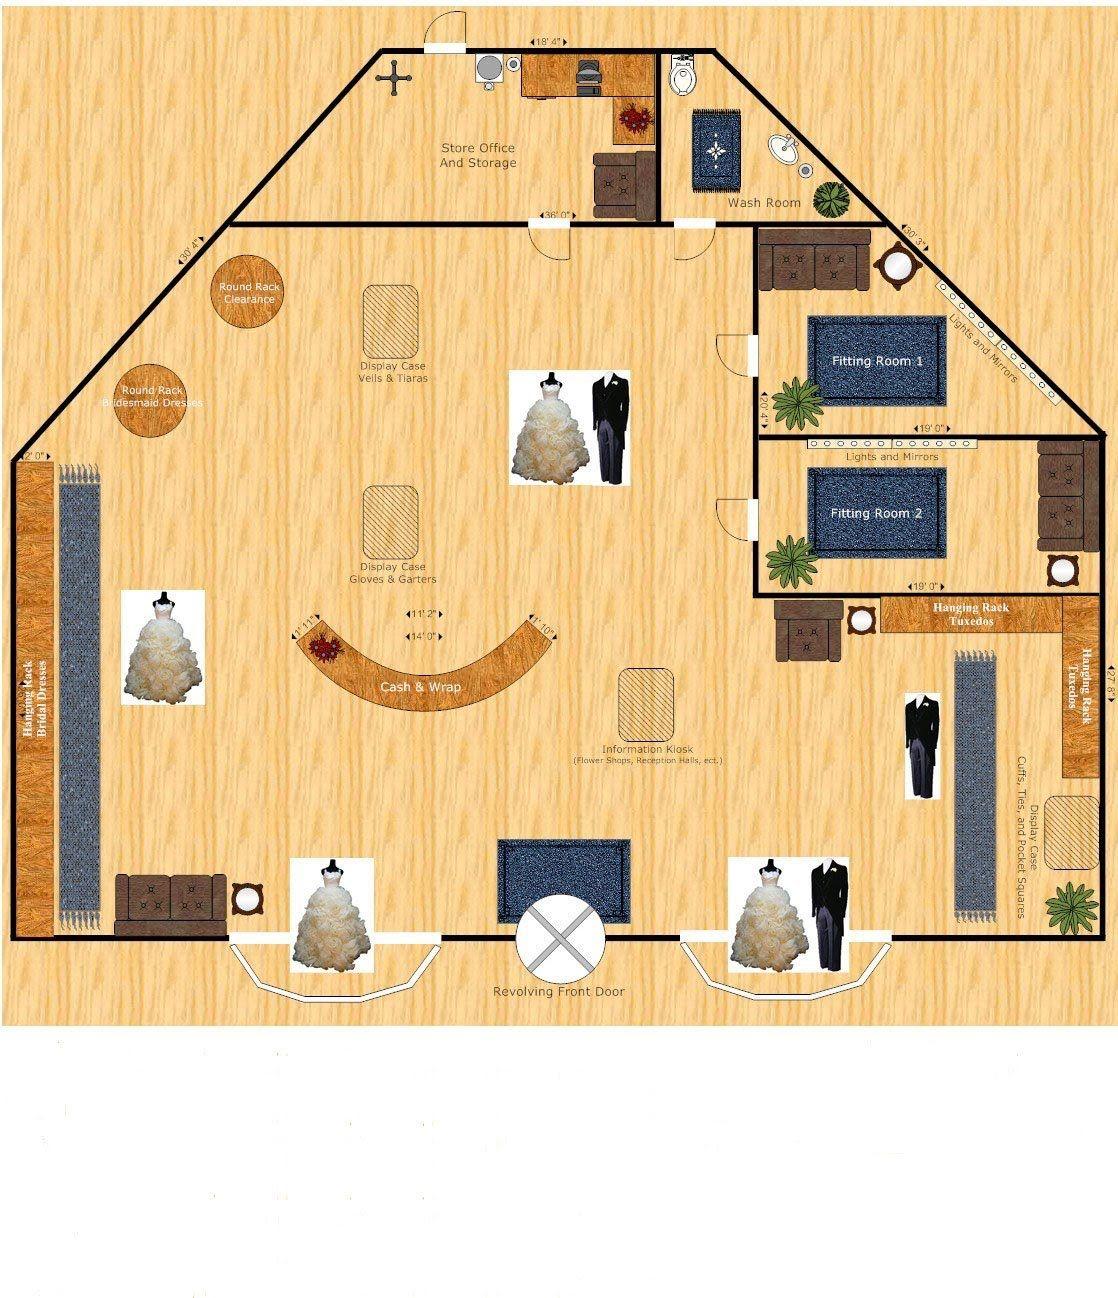 Bridal boutique floor plan interior design google search - Interior design jobs without a degree ...